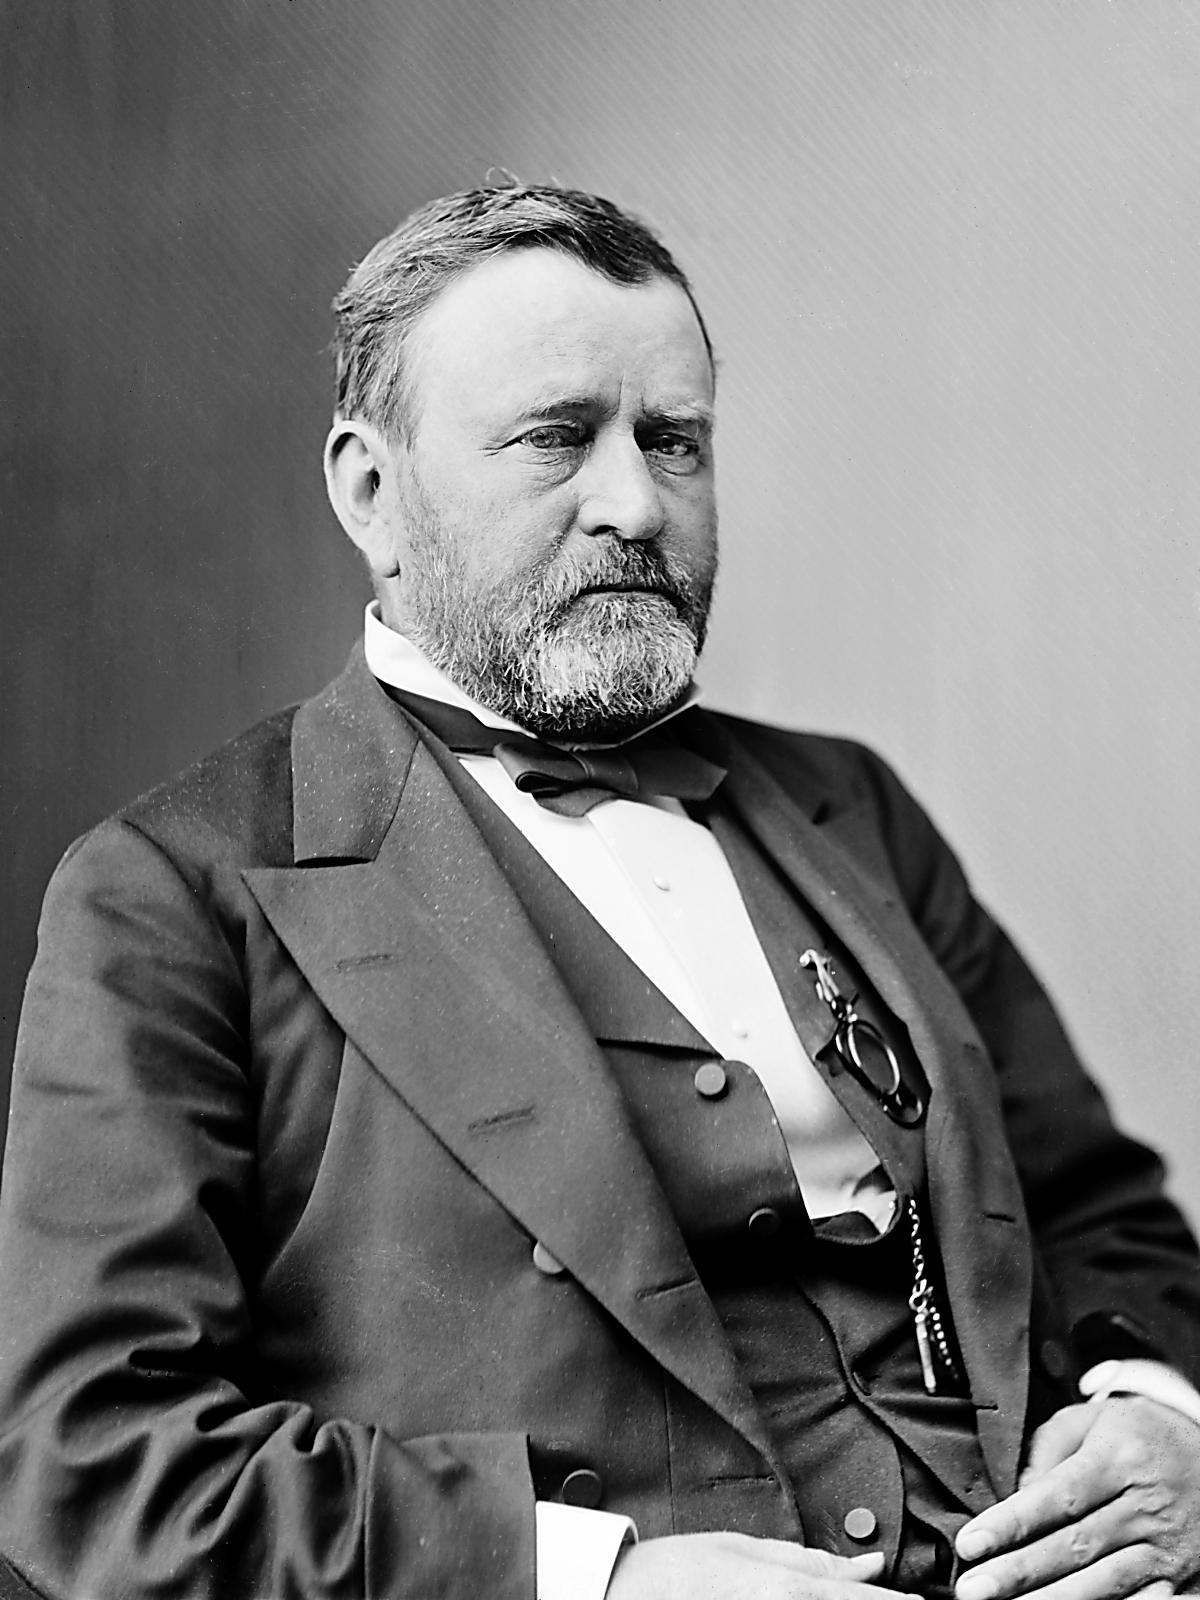 Ulysses S. Grant Charlottesville Monument